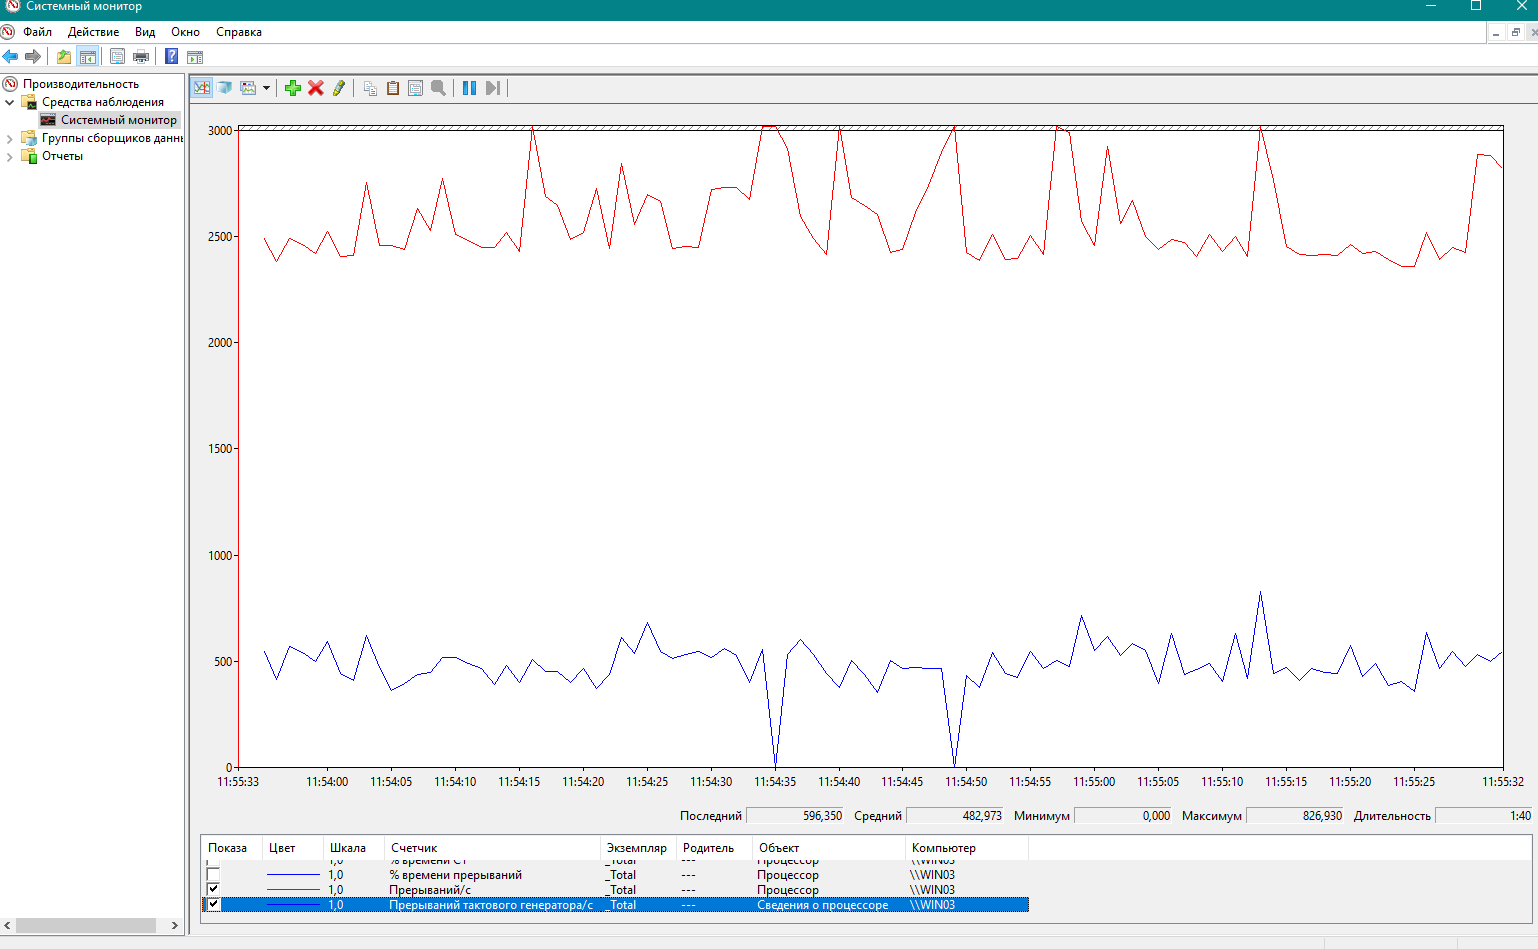 Re: [Qemu-discuss] High host CPU load and slow Windows 10 vm